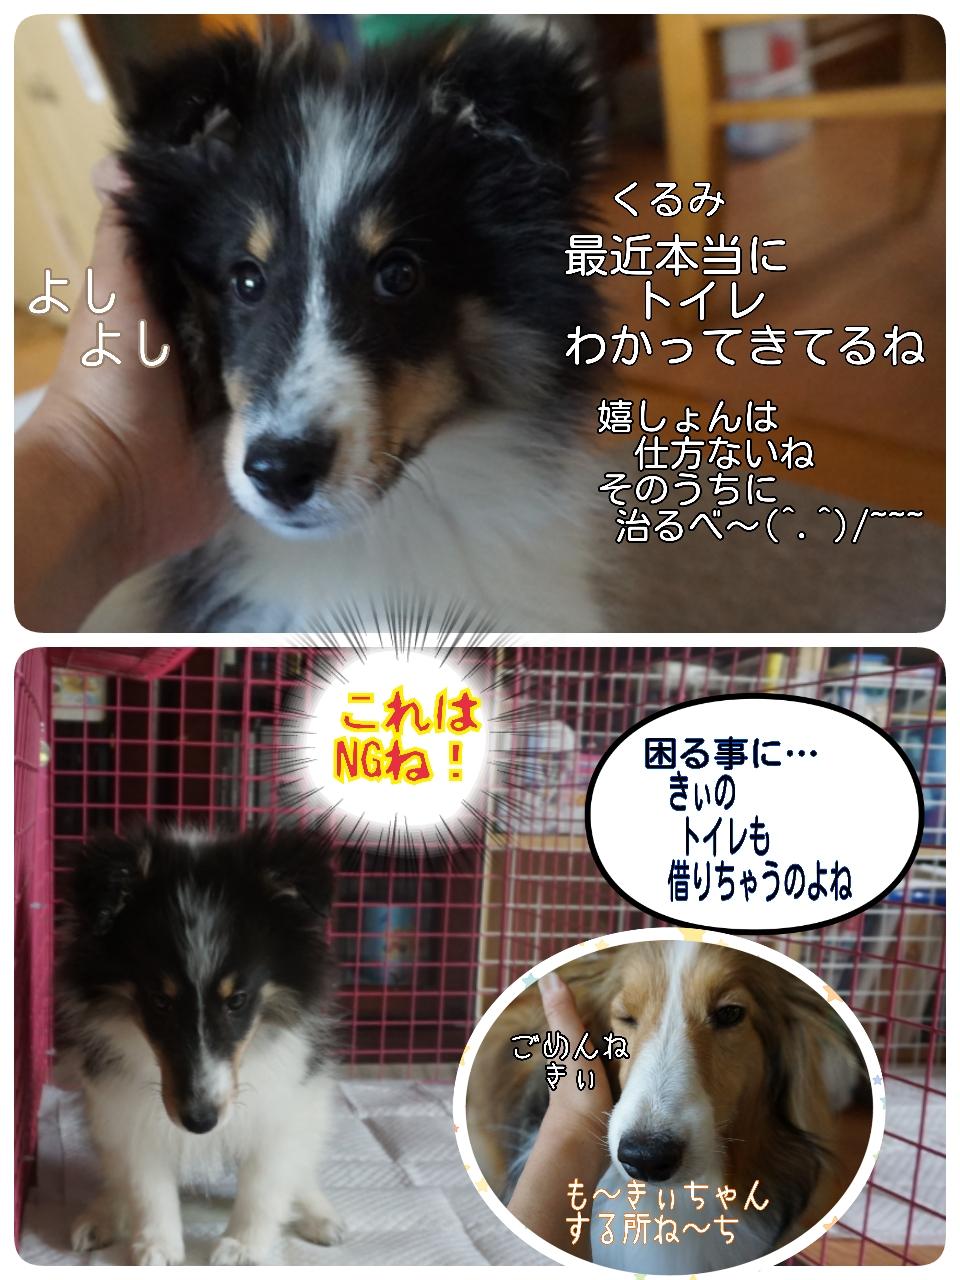 2015-06-05-02-50-13_deco.jpg